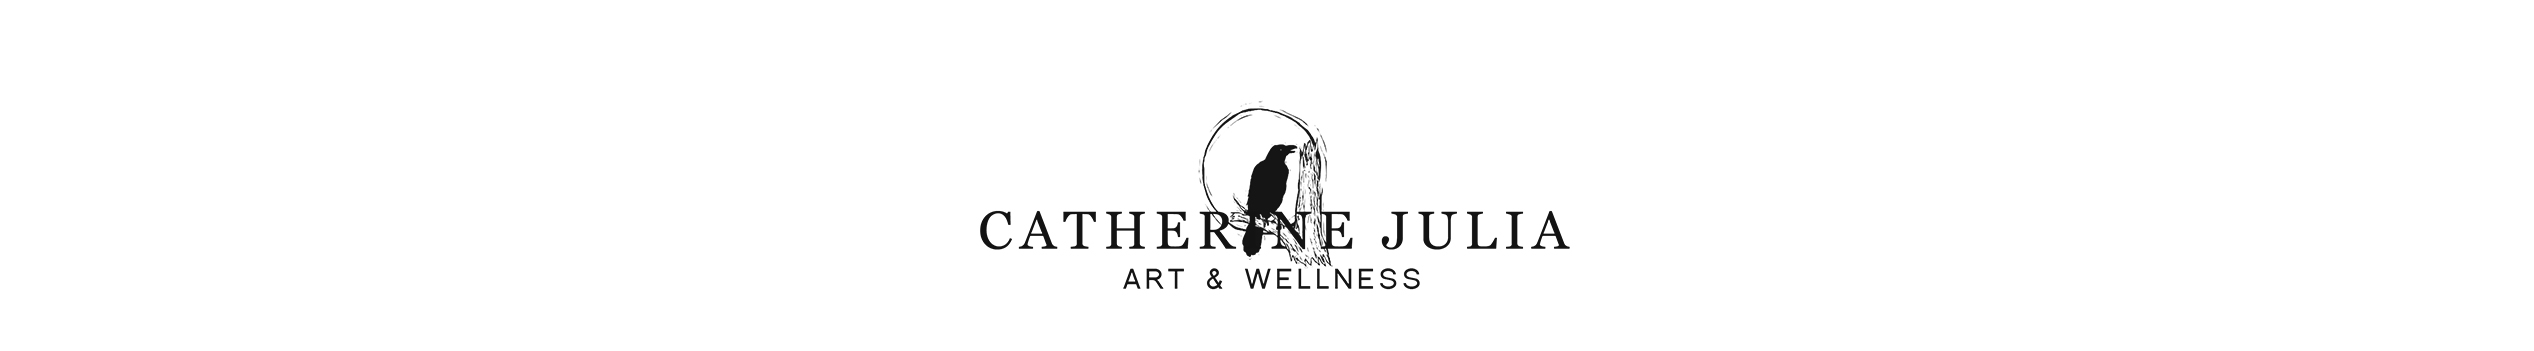 Catherine Julia Art and Wellness